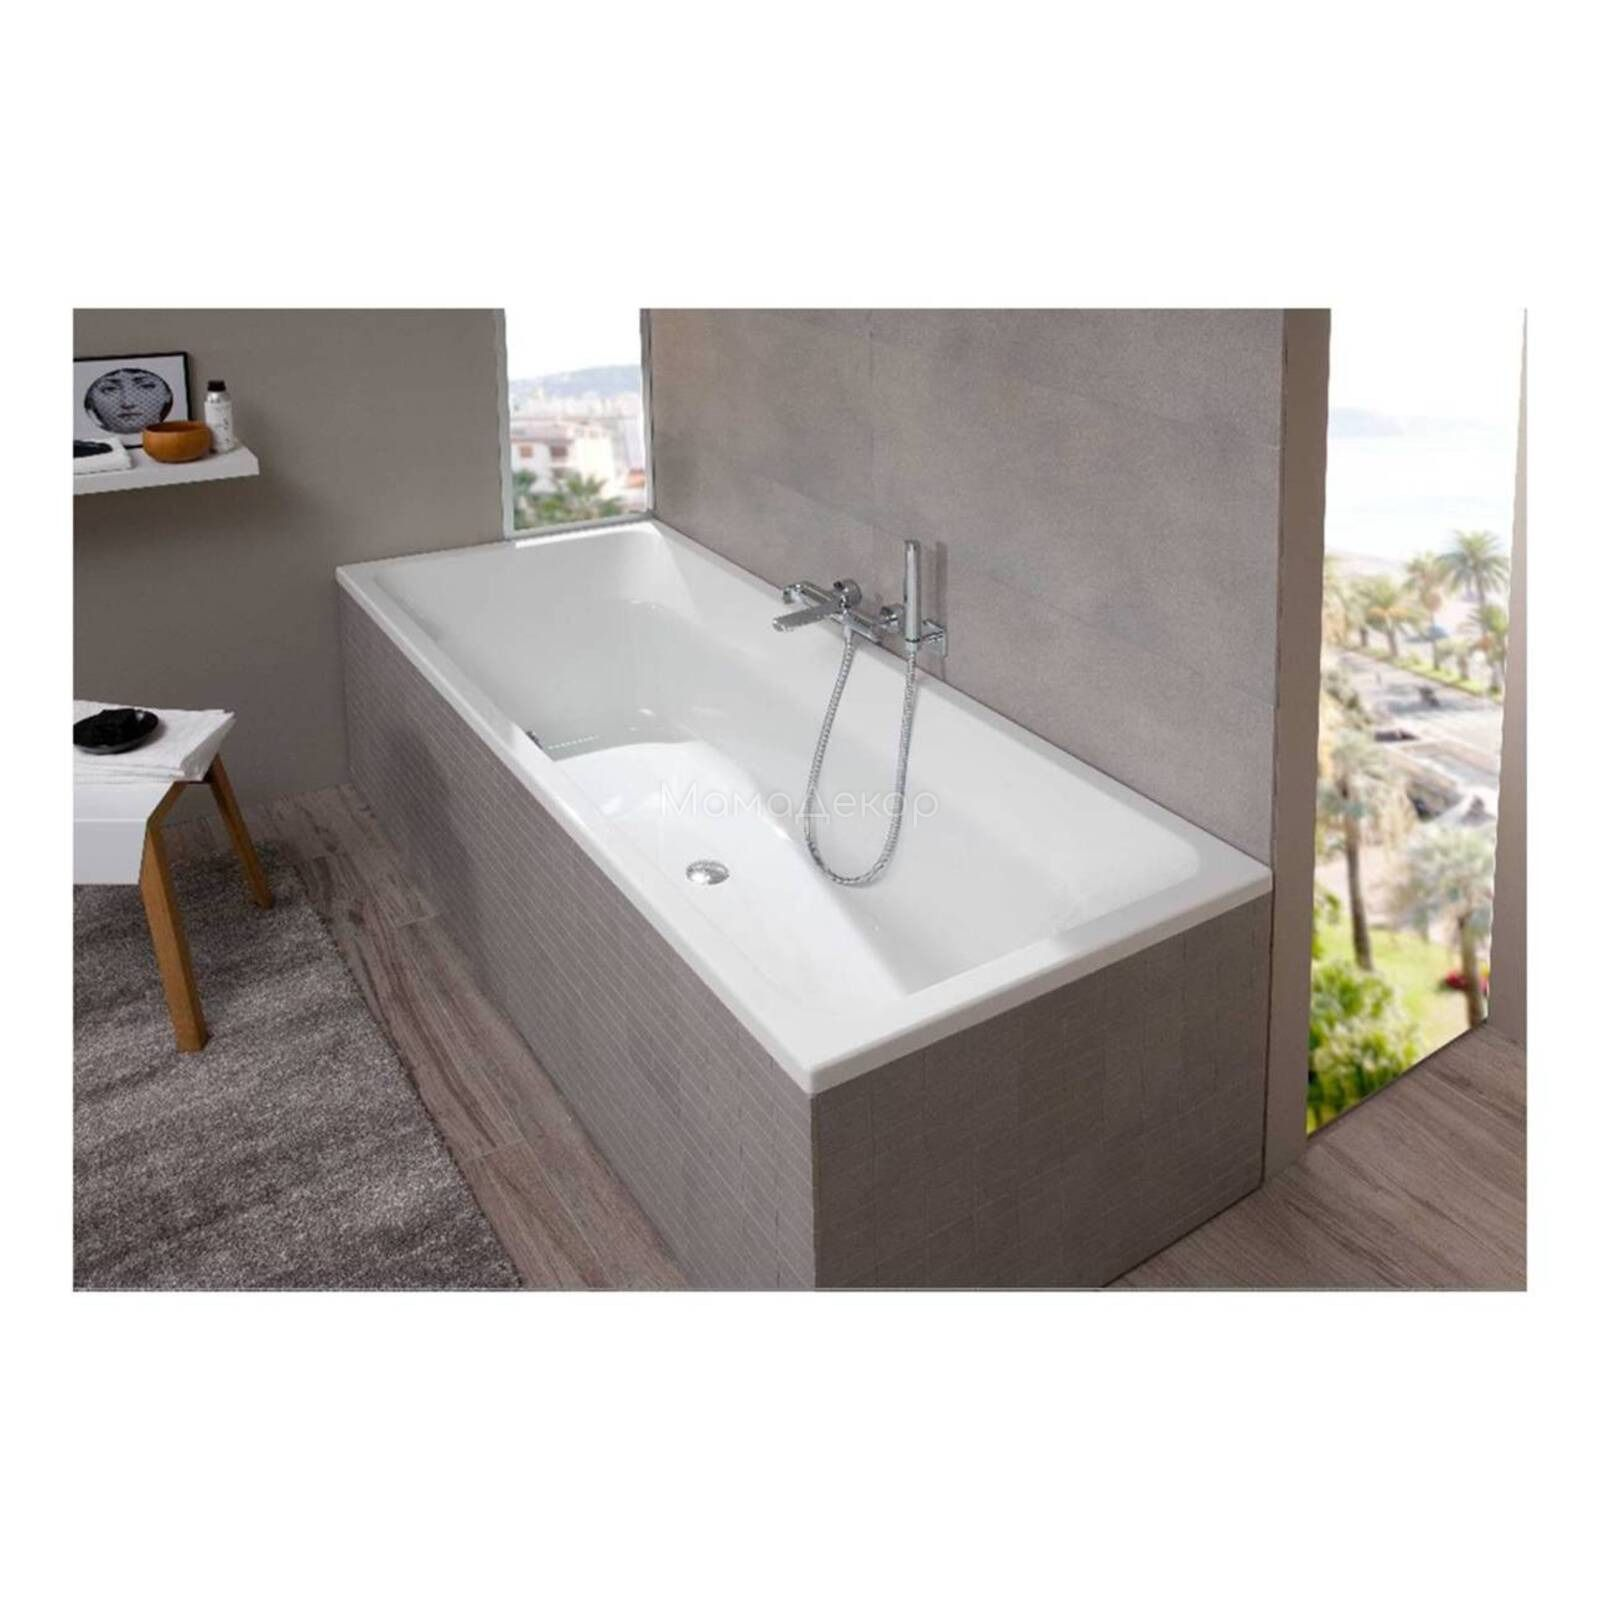 Villeroy Boch Uba170fra2v 01 Targa Built In Bath Bathroom Bathroom Tub